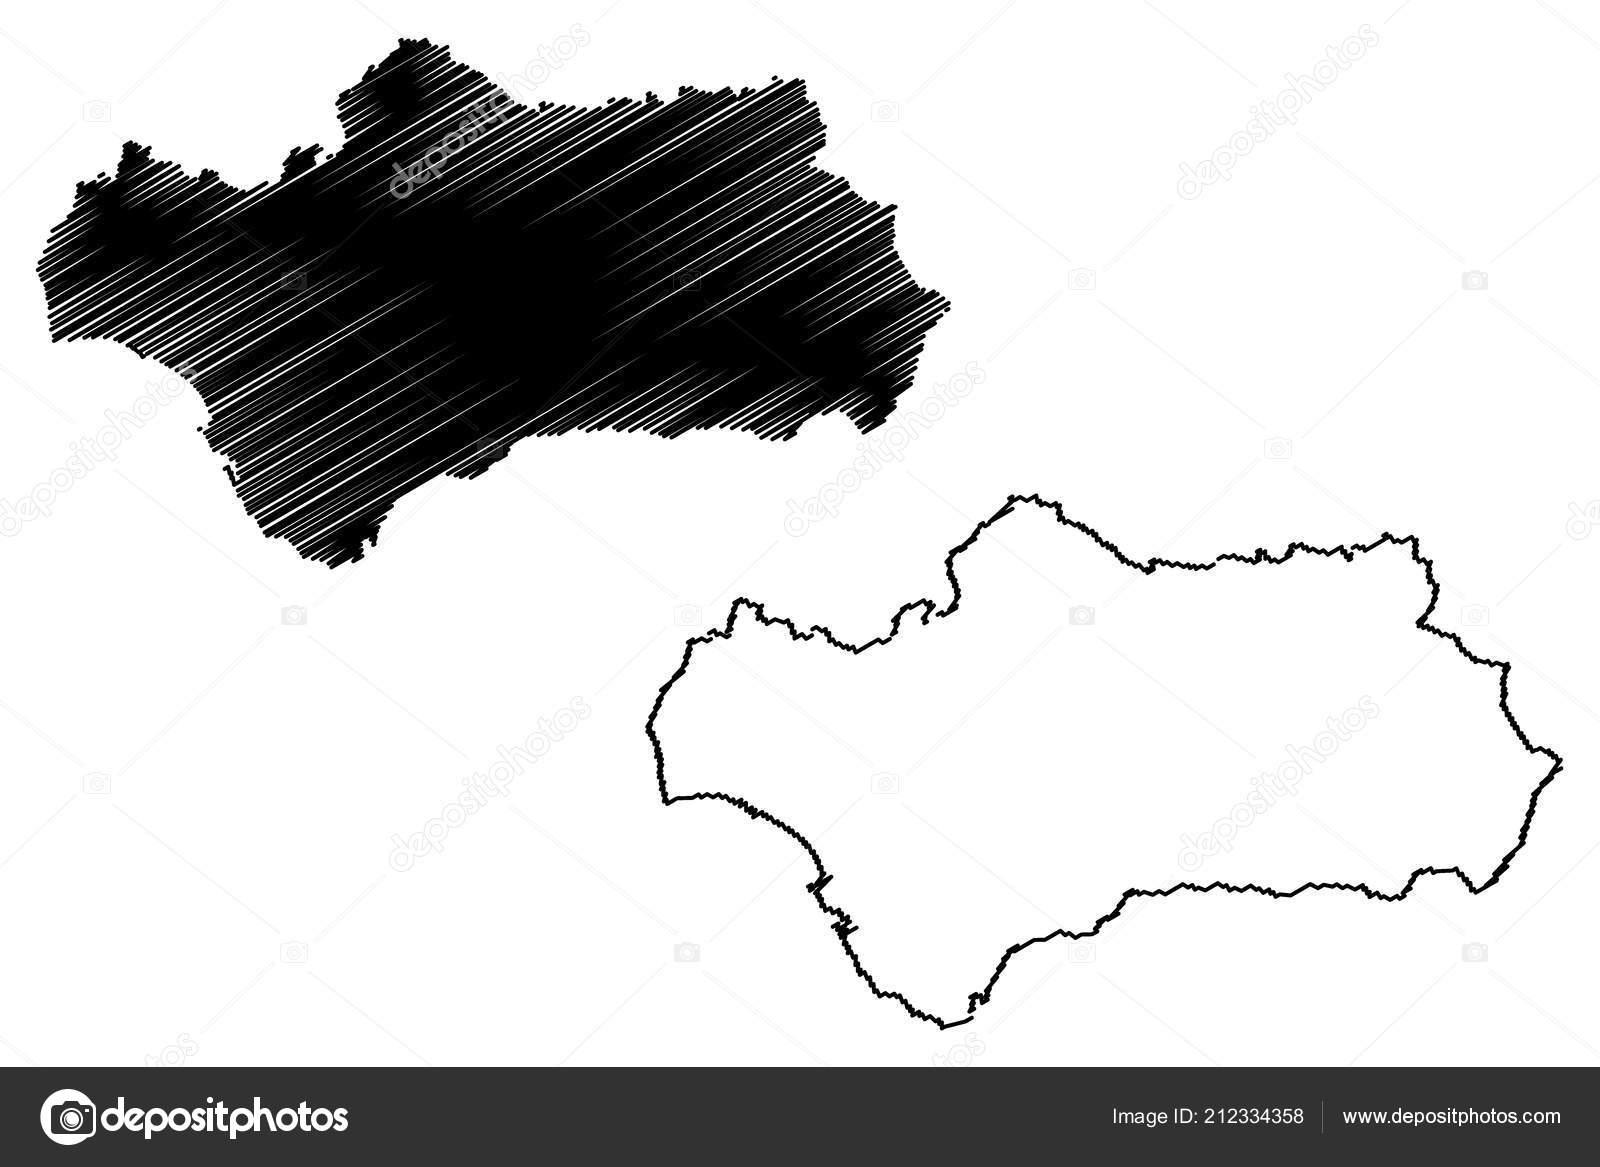 Autonome Regionen Spanien Karte.Andalusien Konigreich Von Spanien Autonome Region Karte